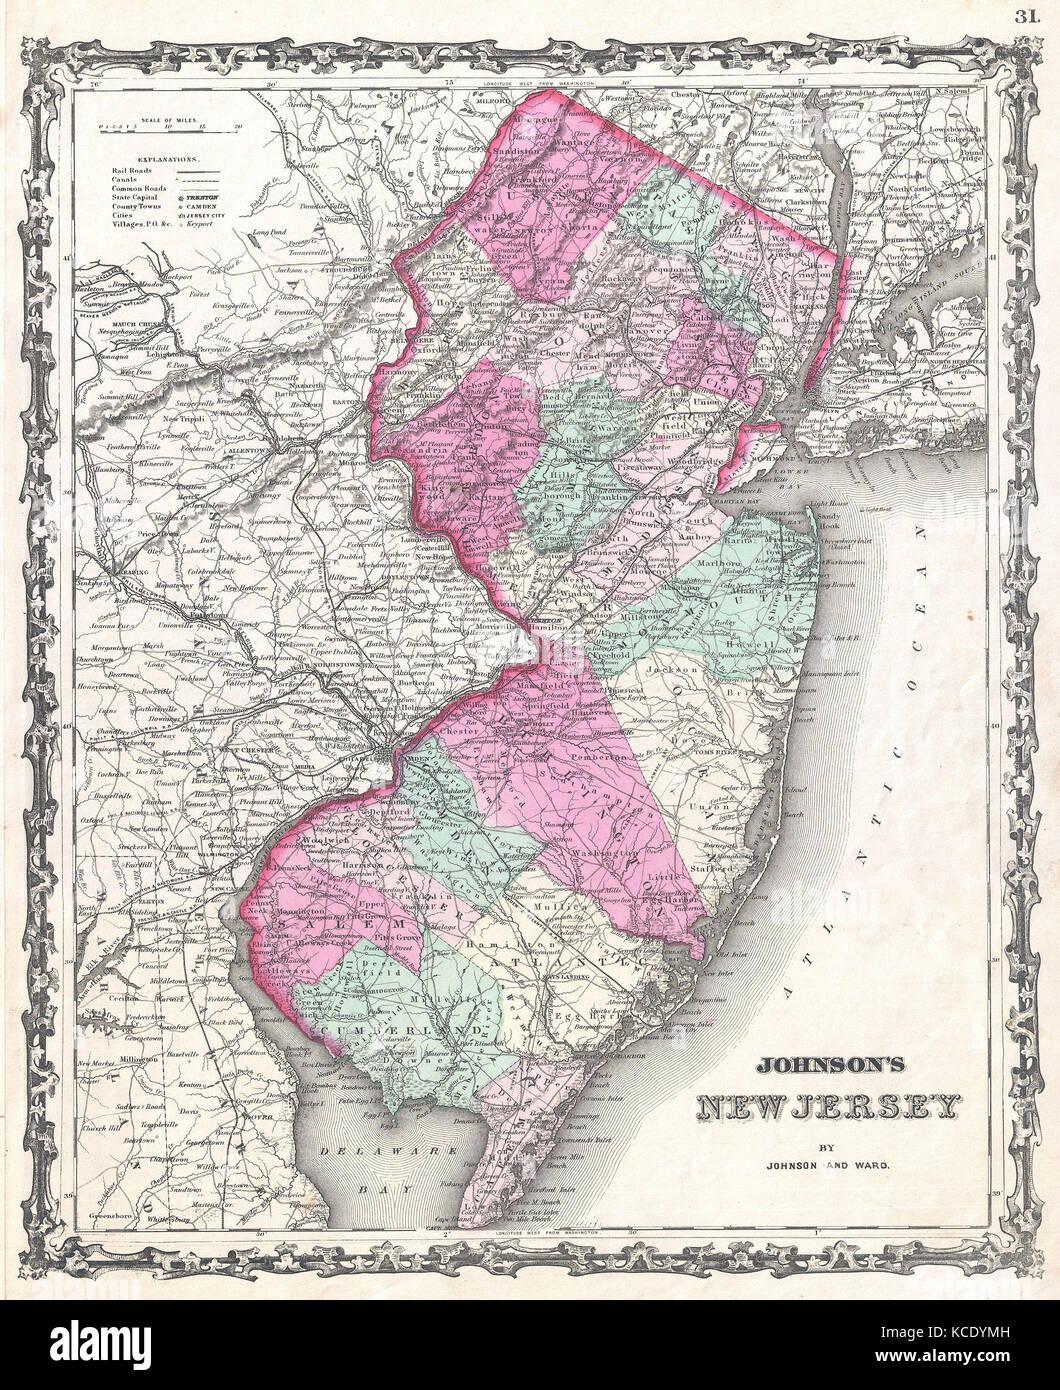 New Jersey Map Imágenes De Stock New Jersey Map Fotos De Stock - Mapa de new jersey